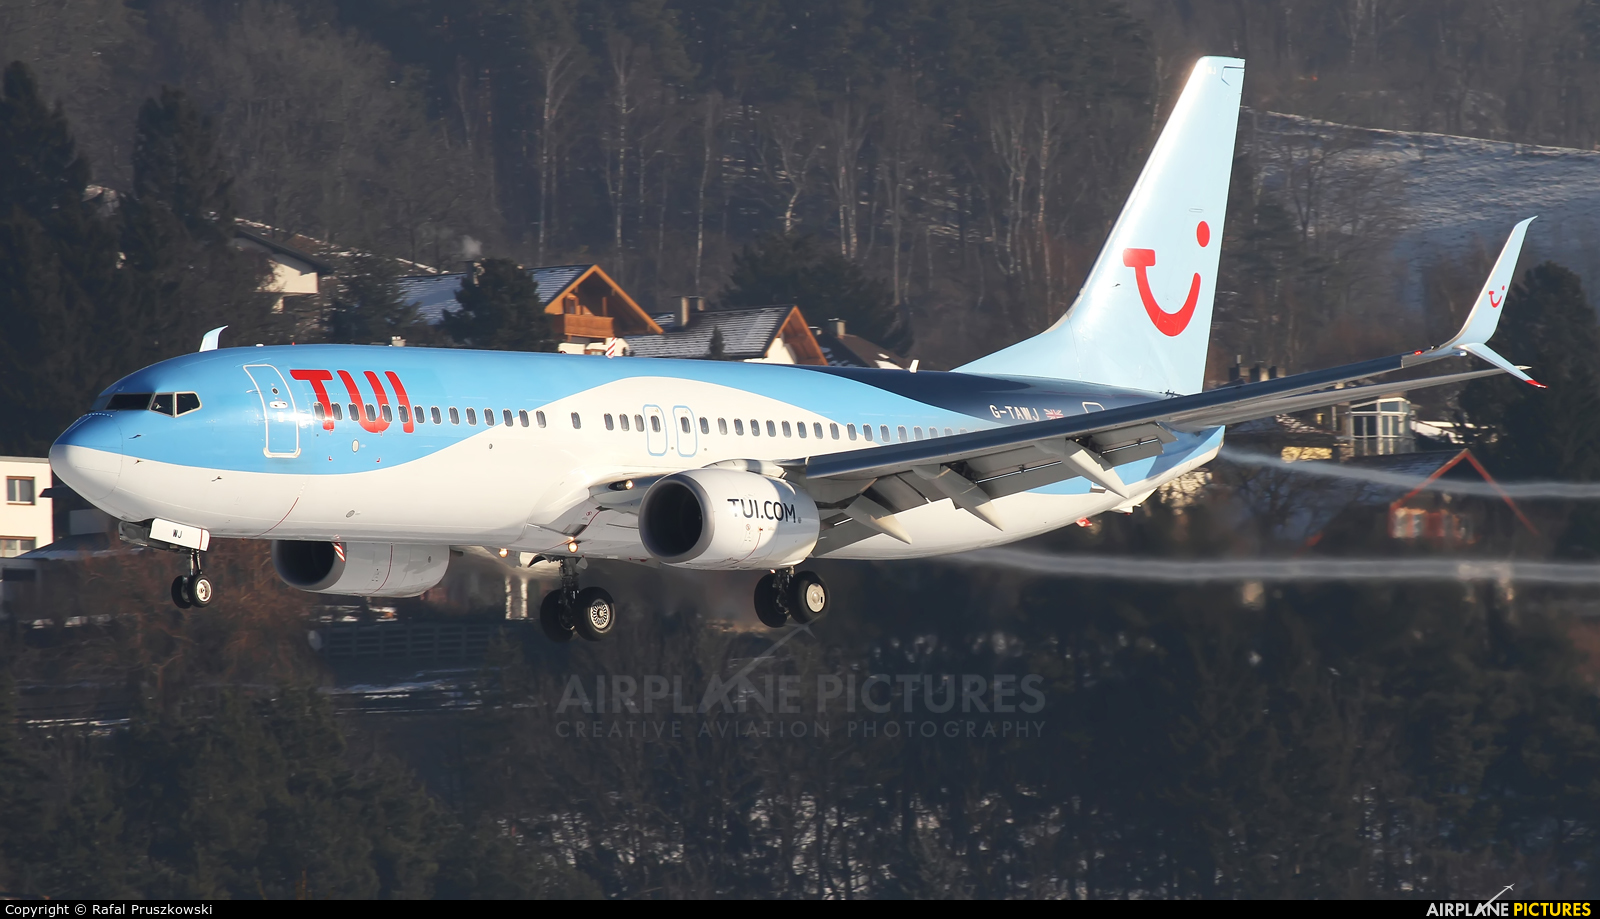 TUI Airways G-TAWJ aircraft at Innsbruck